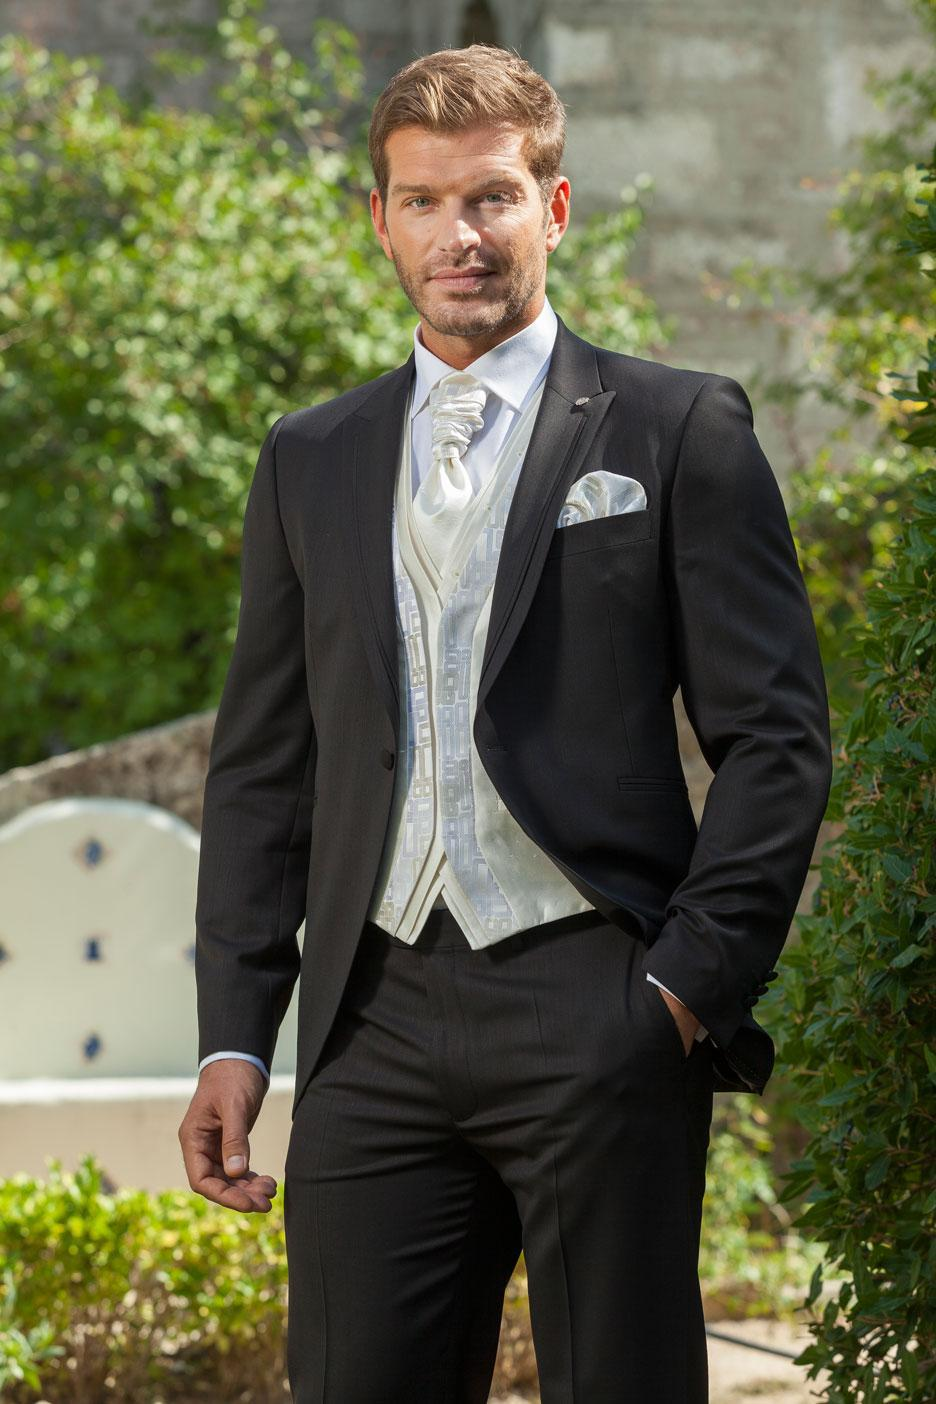 Hot Sale Customized Charcoal Wedding Ceremony Mens Suit Groom Tuxedos Bridegroom And Groomsman Suit Jacket+Pants+Tie+Vest